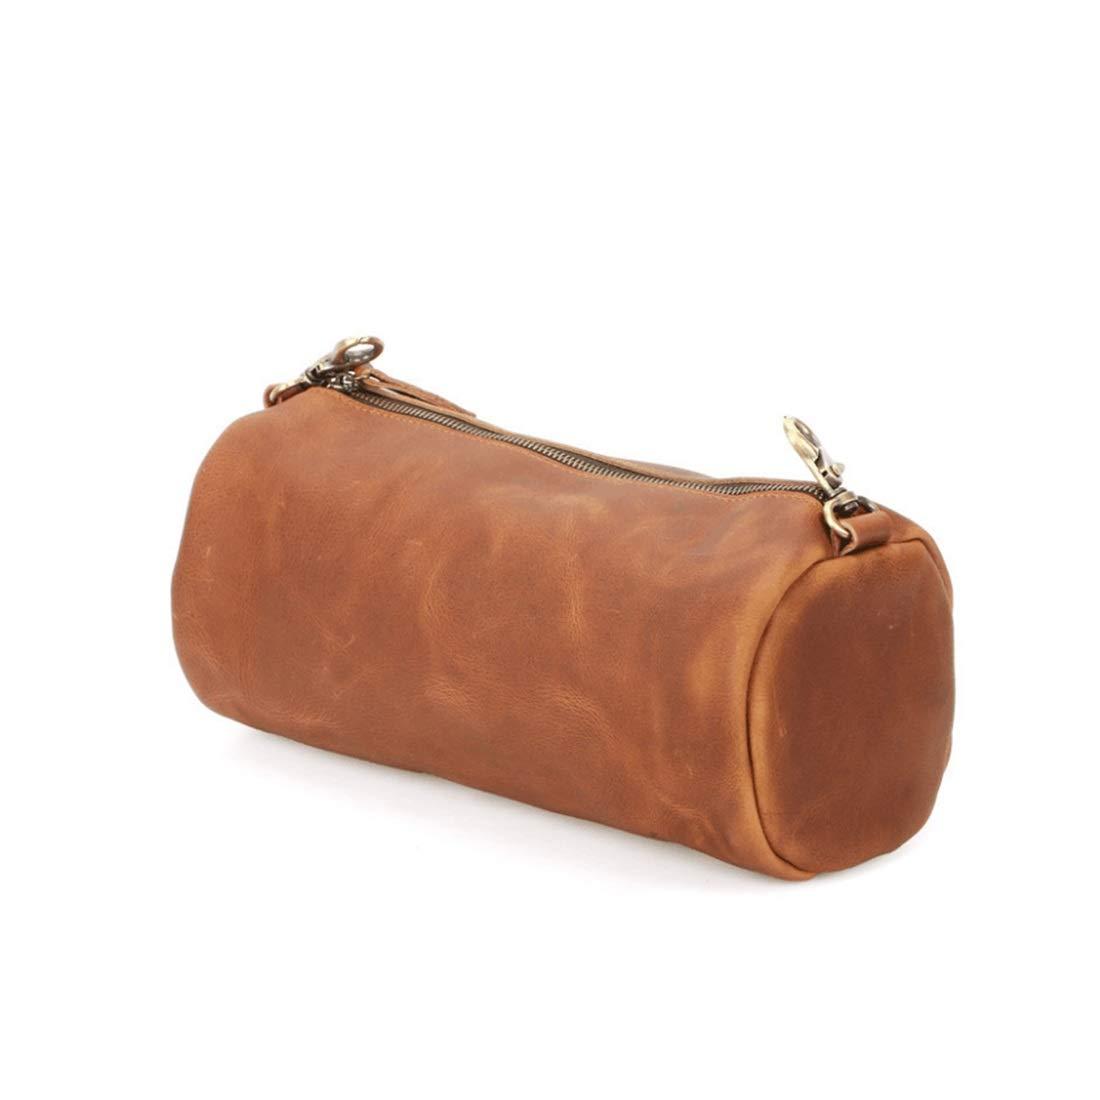 Color : Brown1 Carriemeow Mens Genuine Leather Chest Bag Sling Shoulder Bag Daypack Crossbody Bag for Hiking Camping